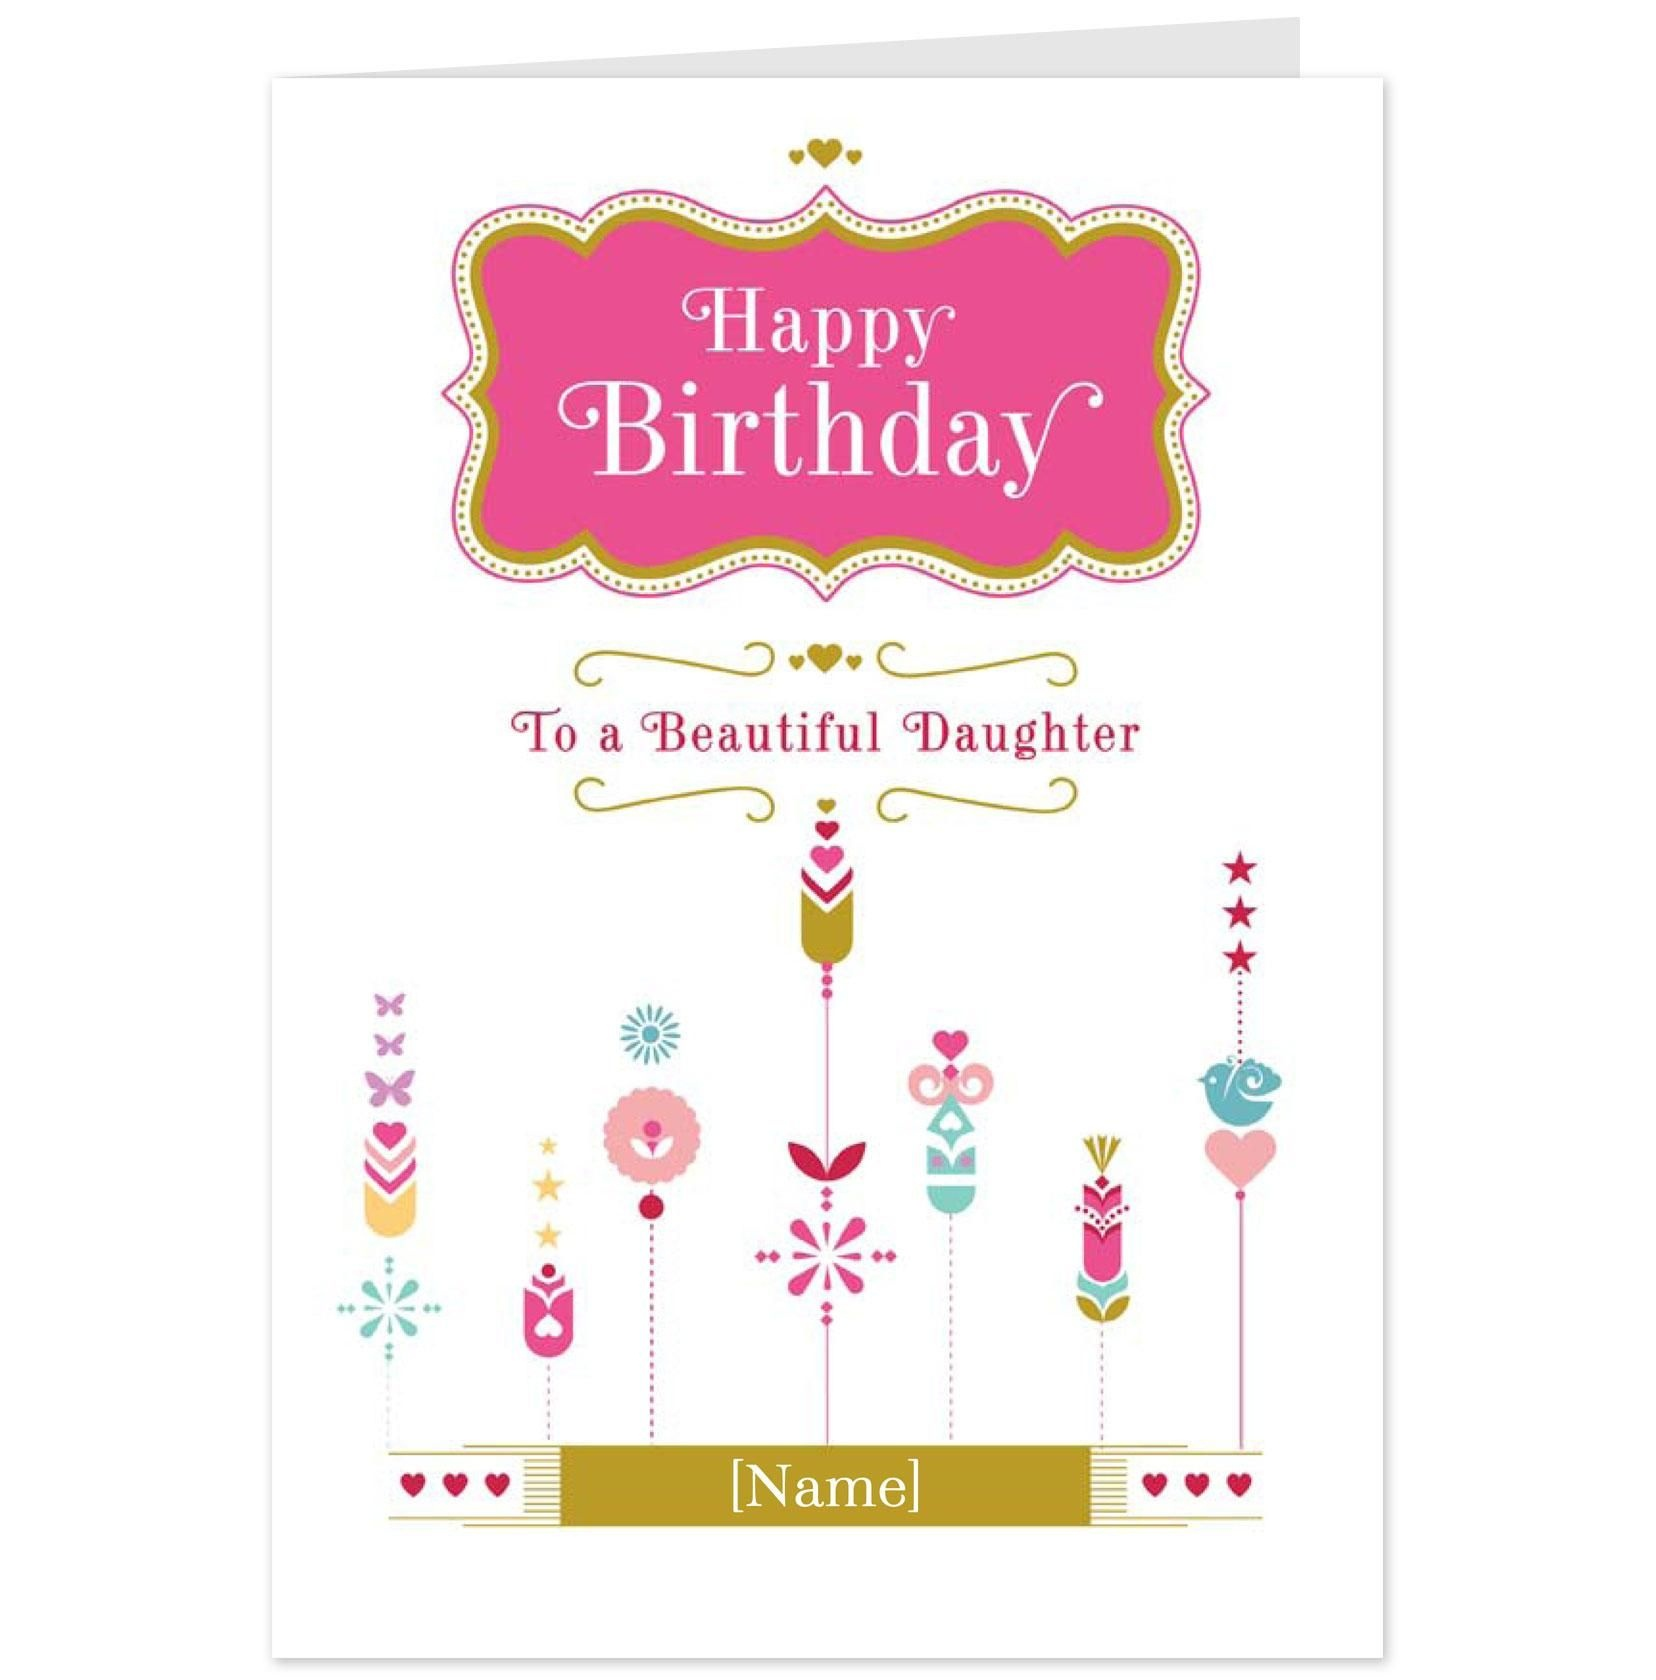 Free Printable Hallmark Birthday Cards   My Birthday - Free Printable Greeting Cards Hallmark